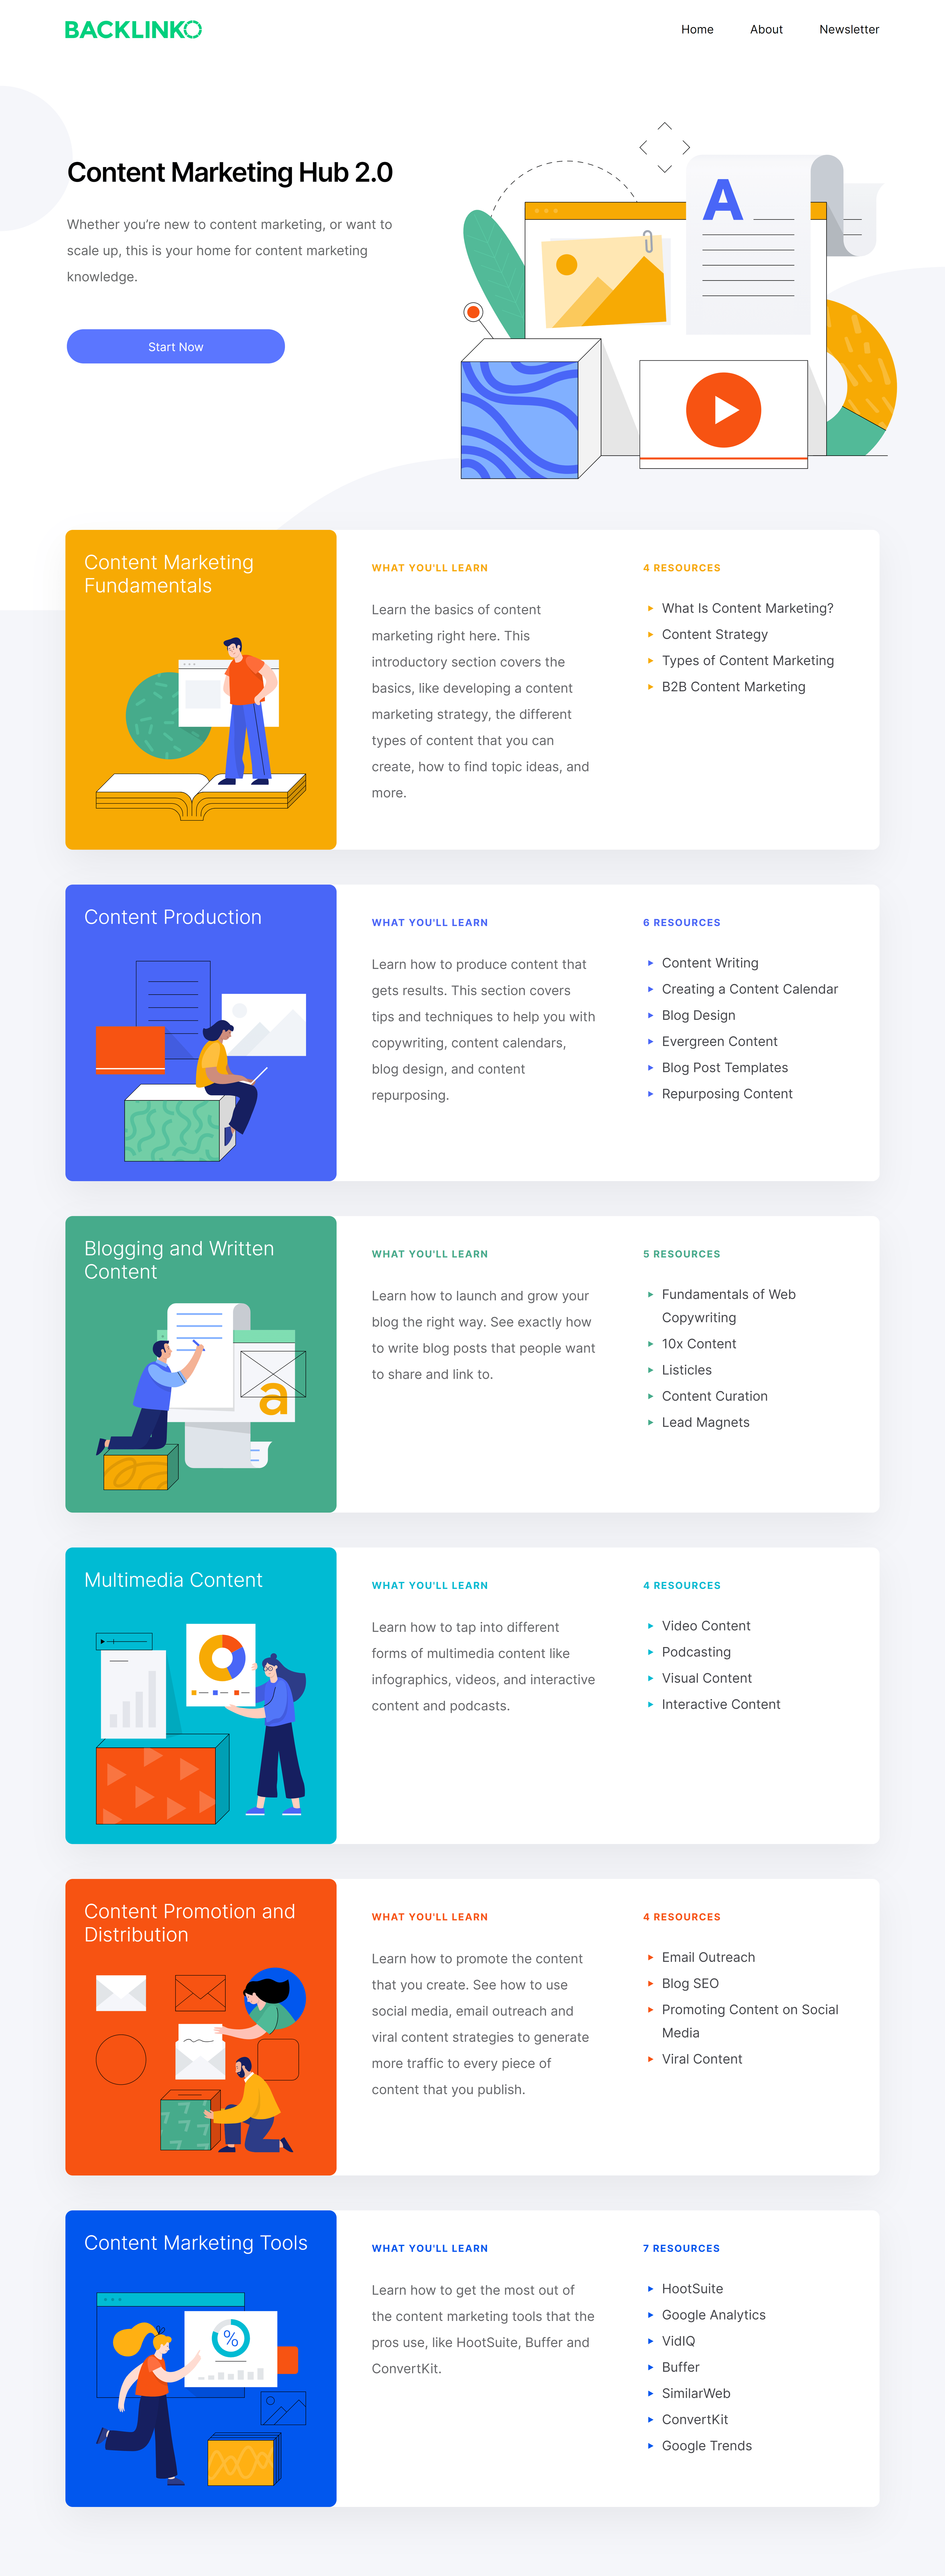 Backlinko – Content Marketing Hub 2.0